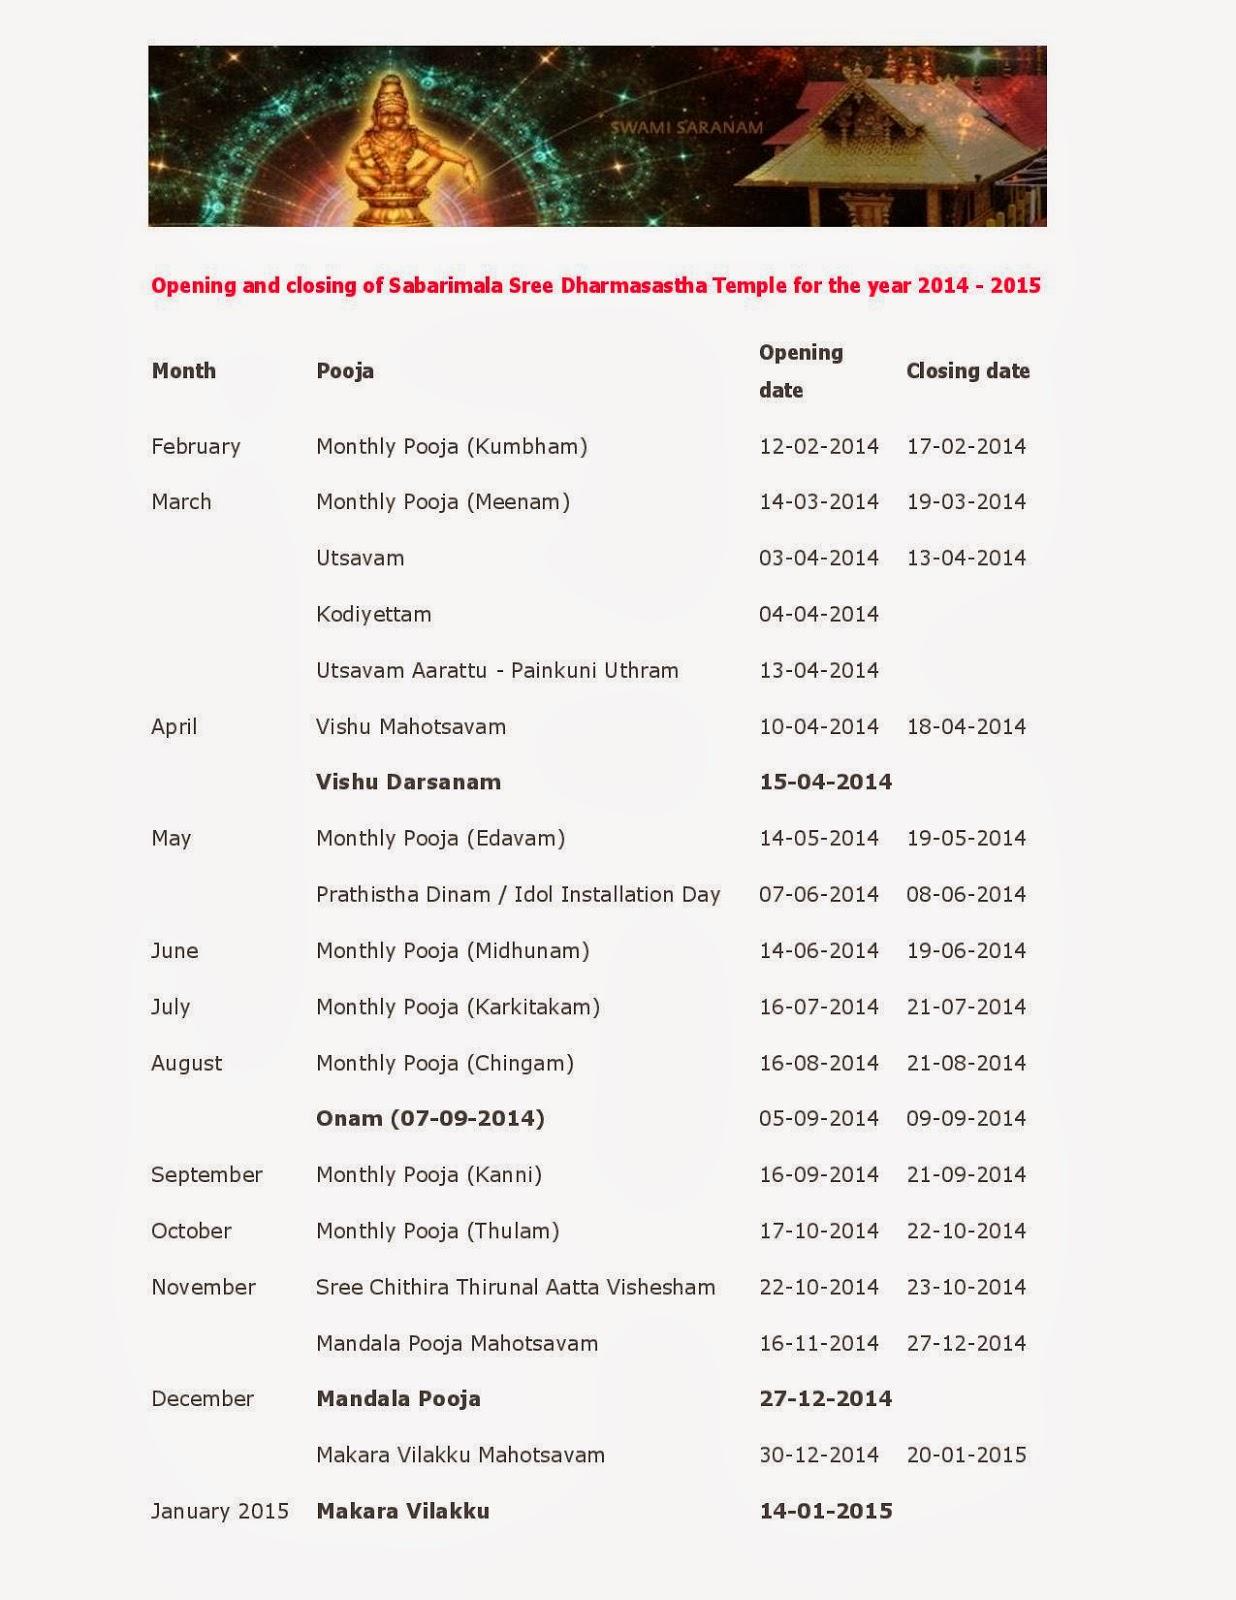 ViJay Kandan: Sabarimala Festival Calendar 2014-2015